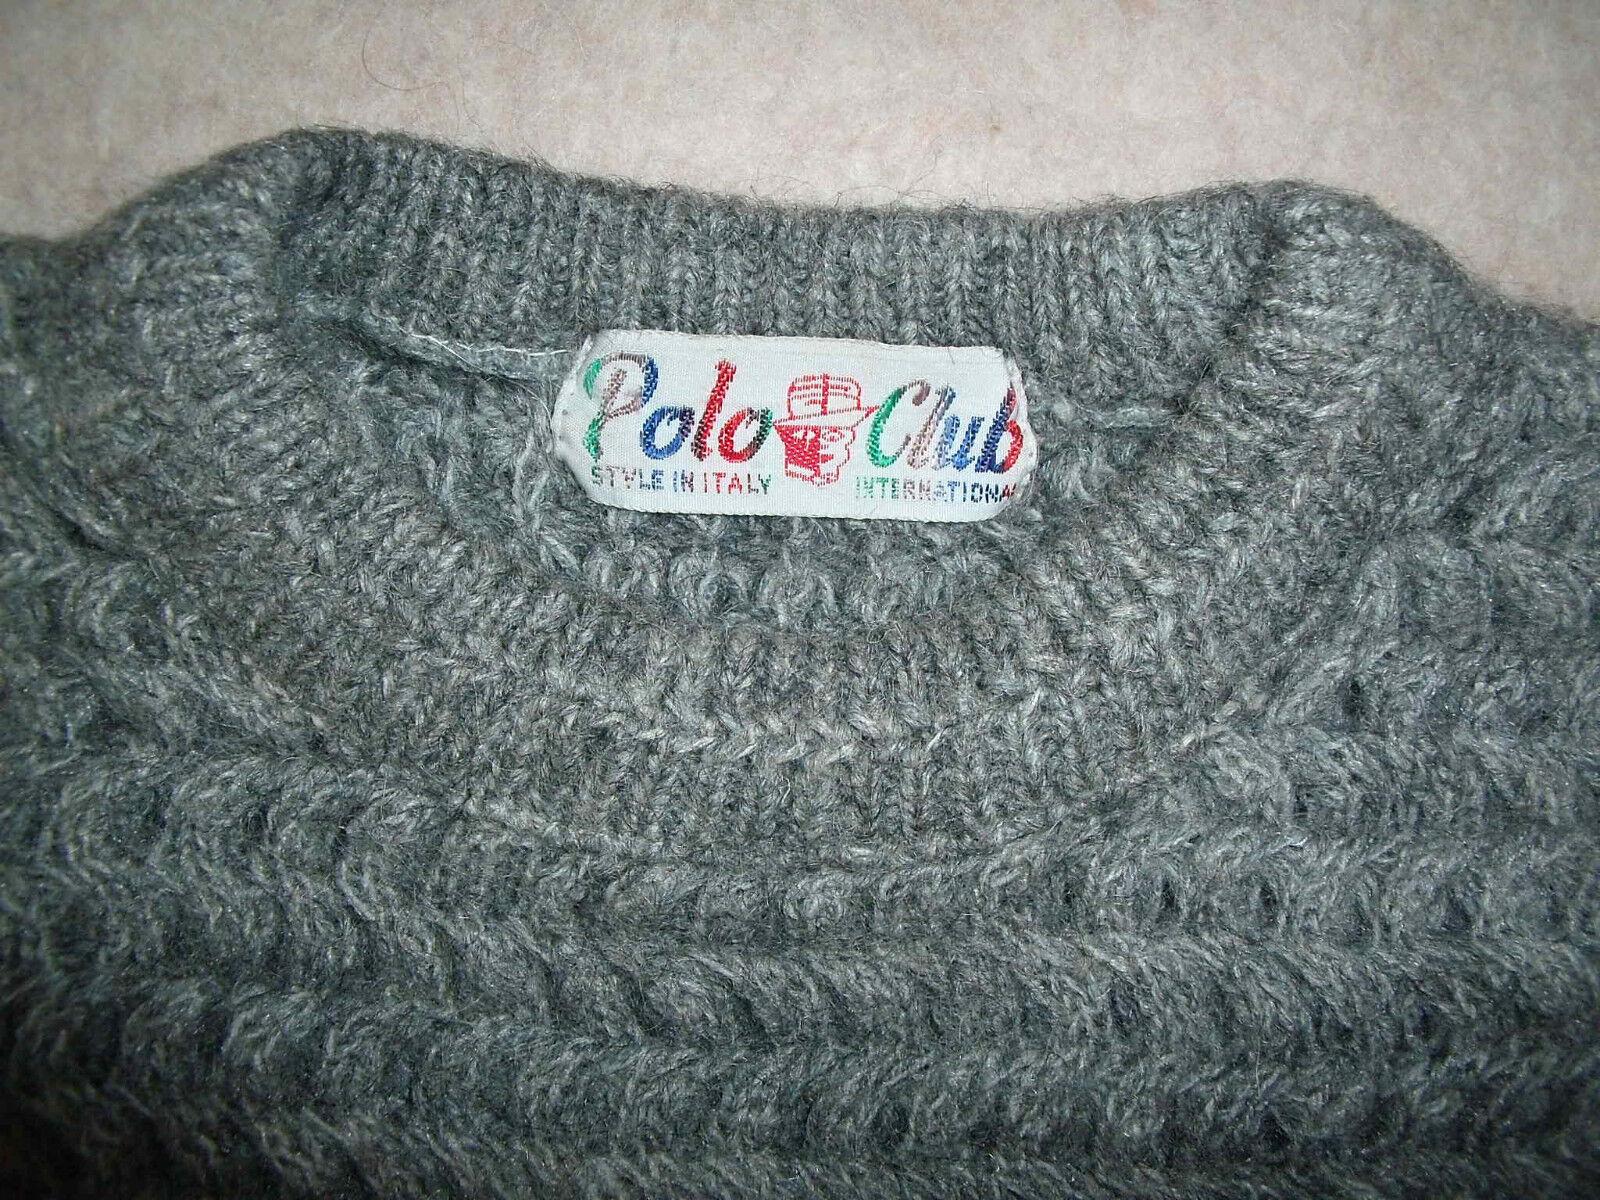 Elegante & calde = UOMO MOHAIR-Pully dal  Polo Club  Tg. 52-54  NUOVO